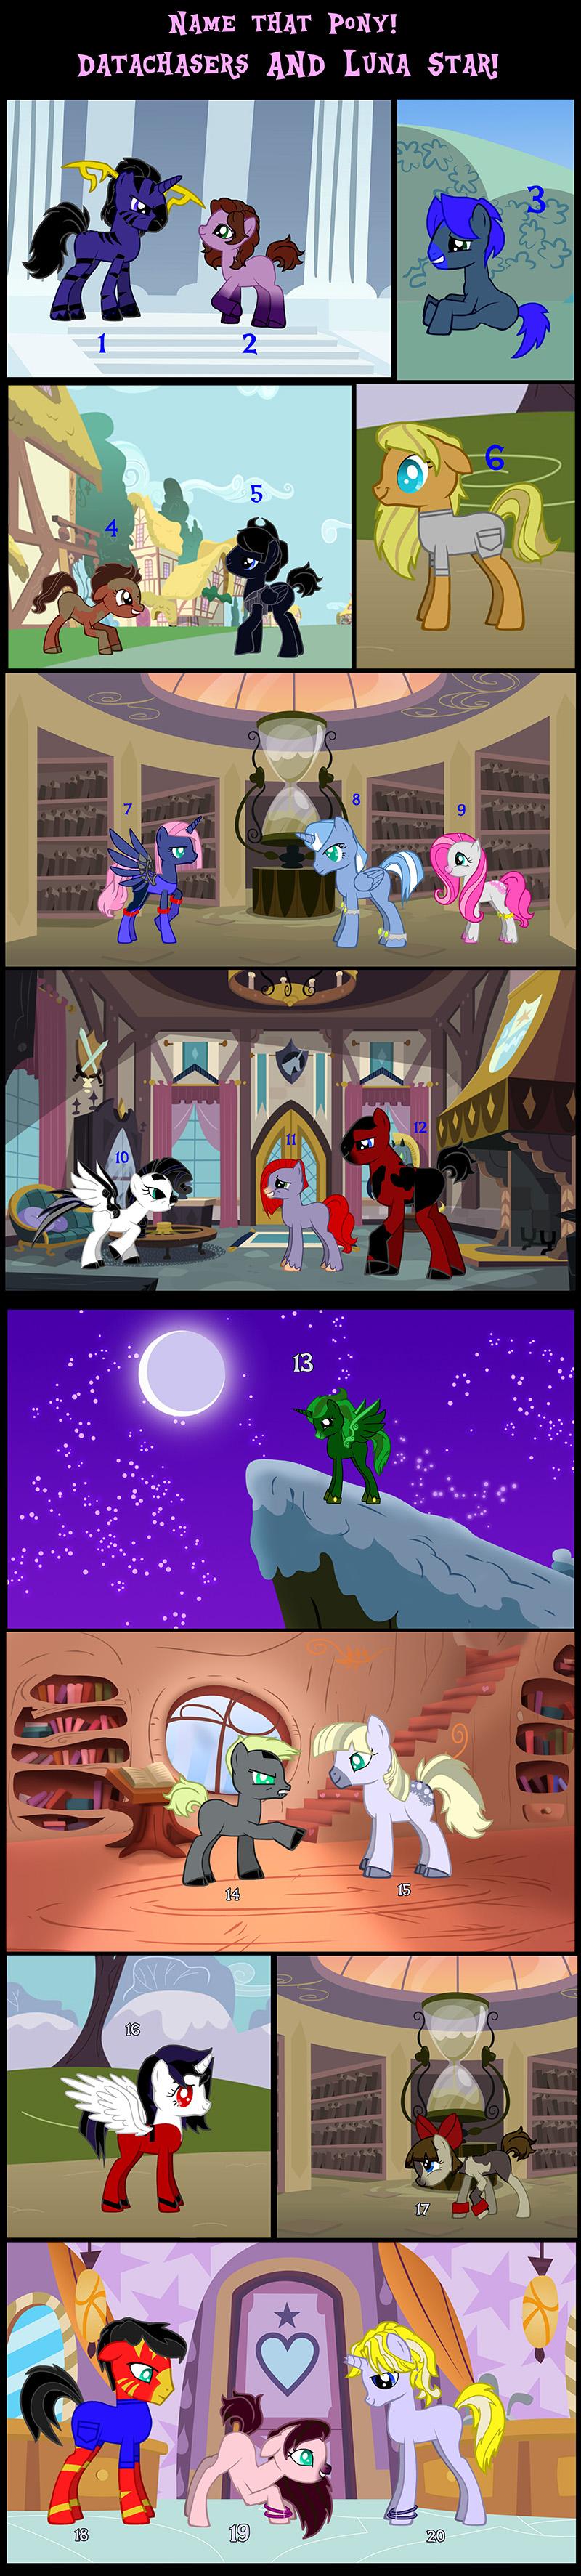 Name that Pony !